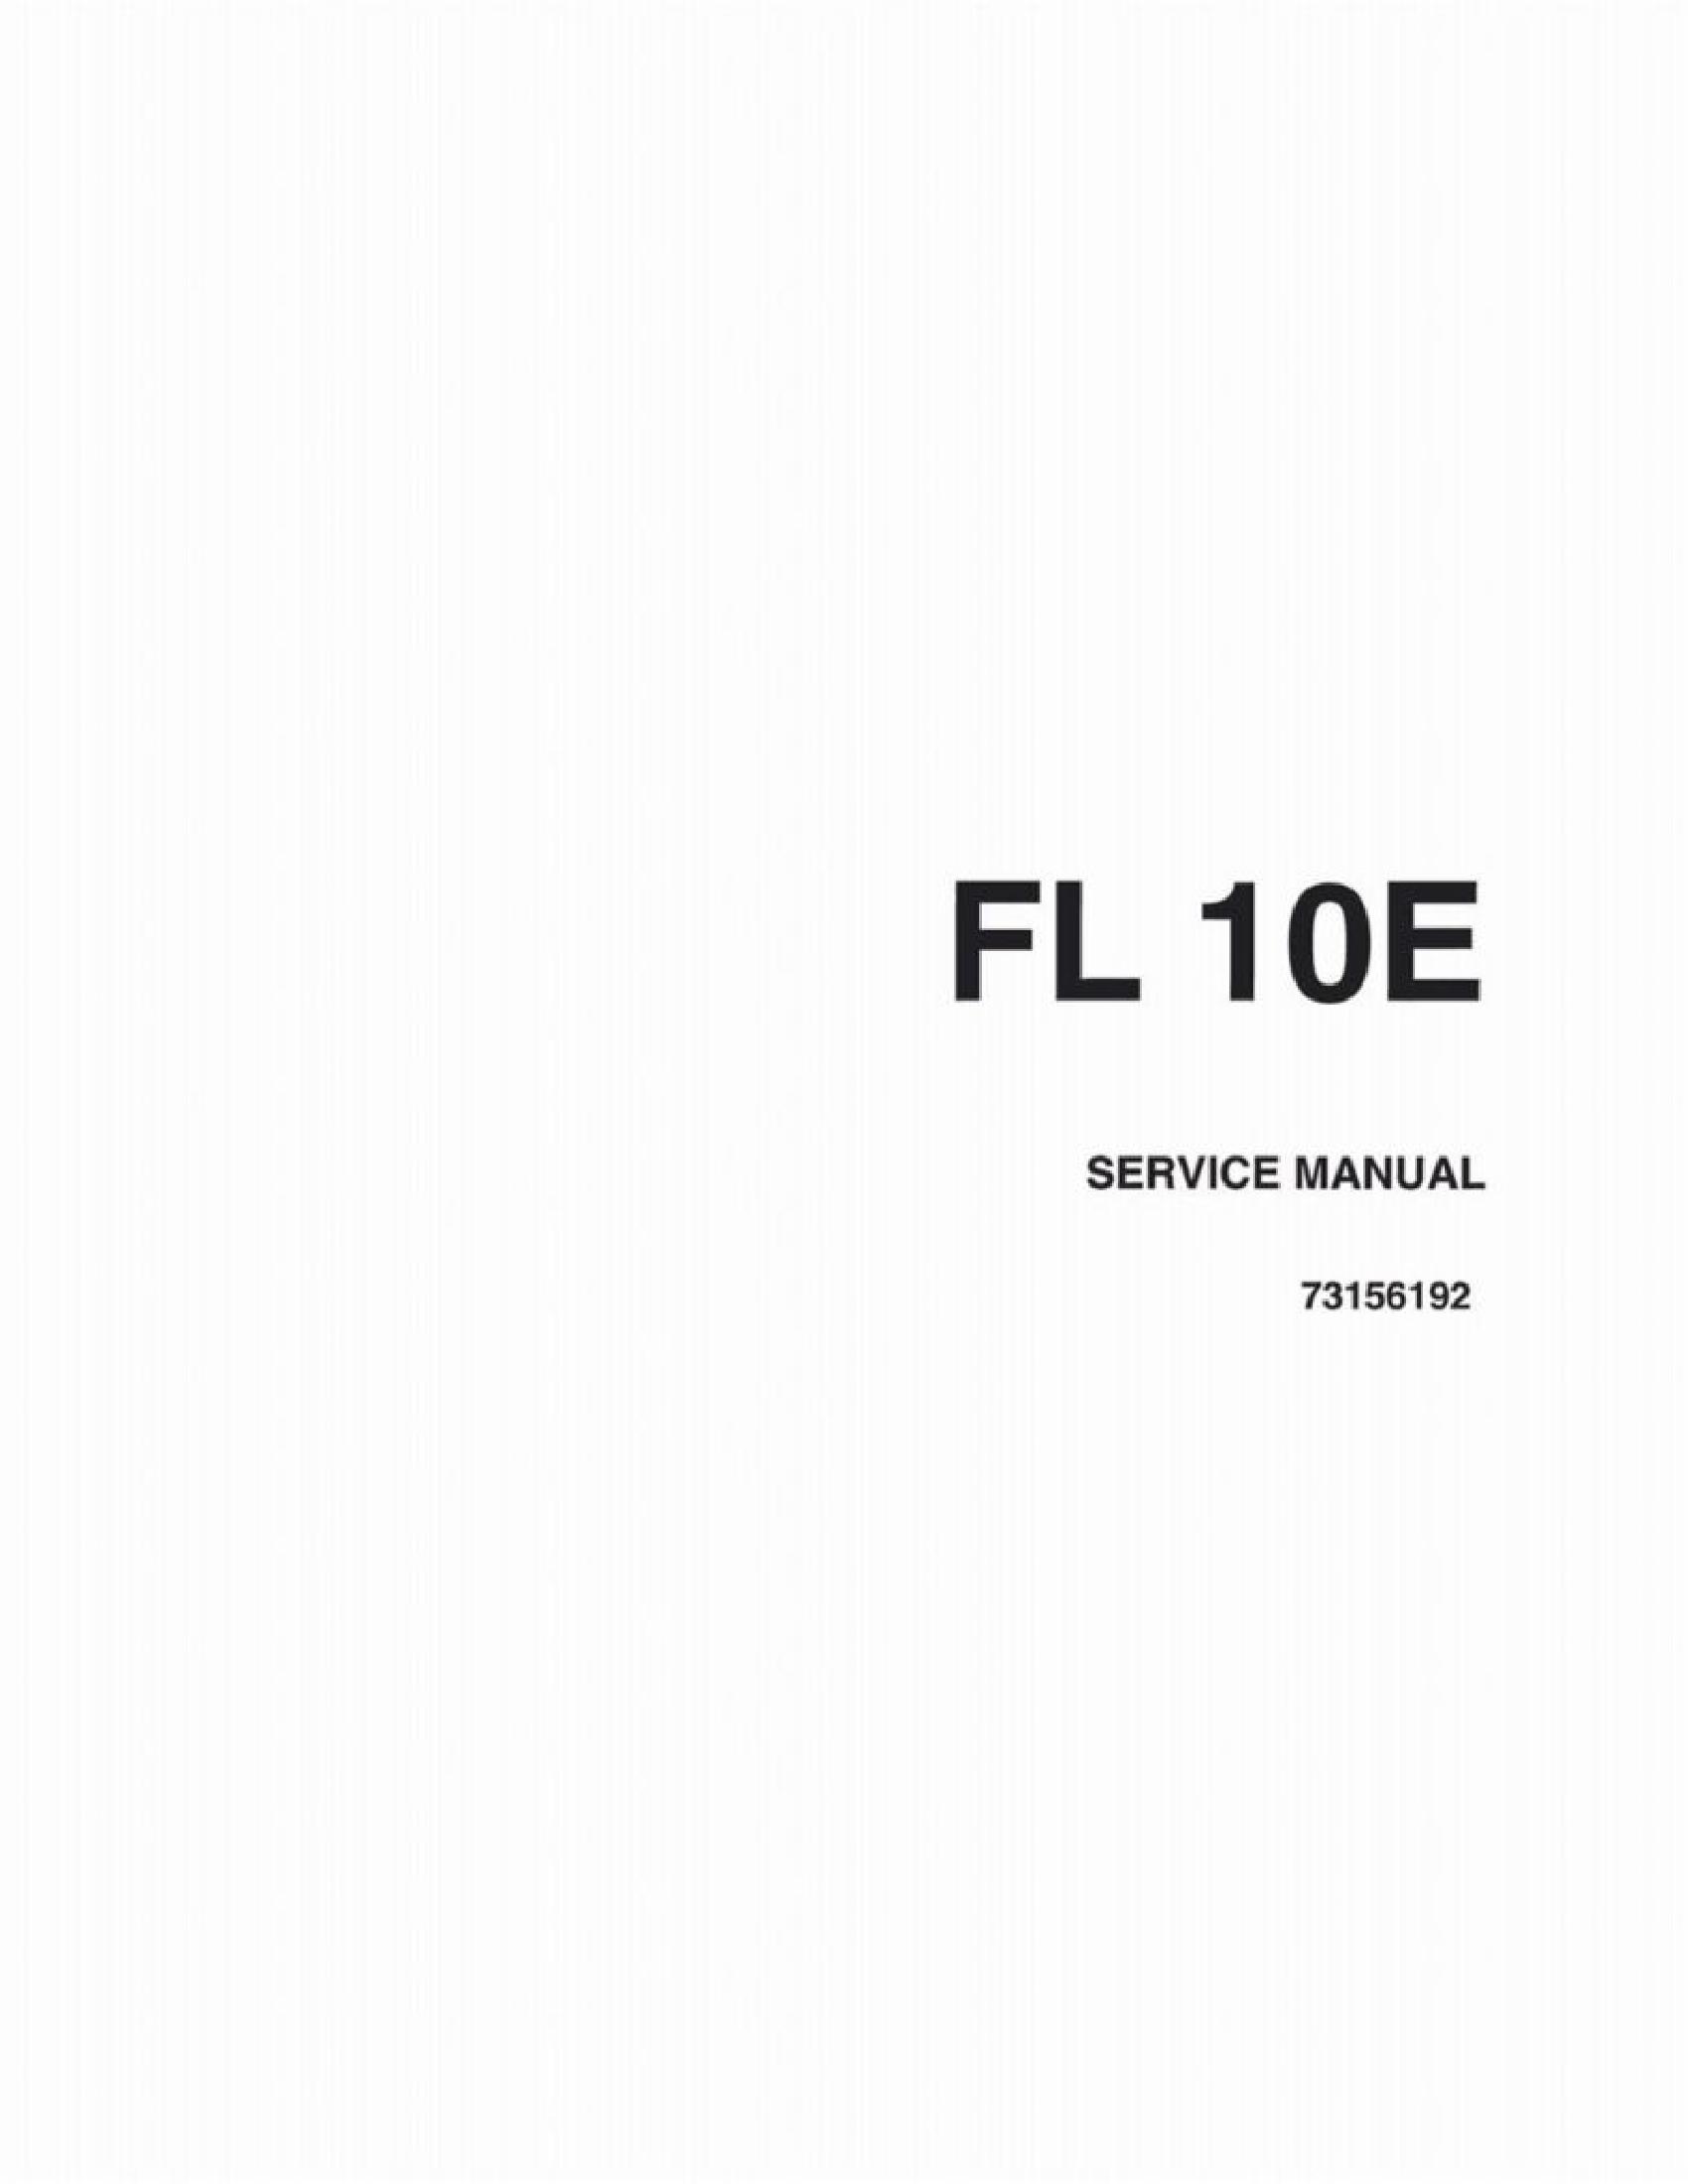 Fiat-Allis 10E FL Crawler Loader manual